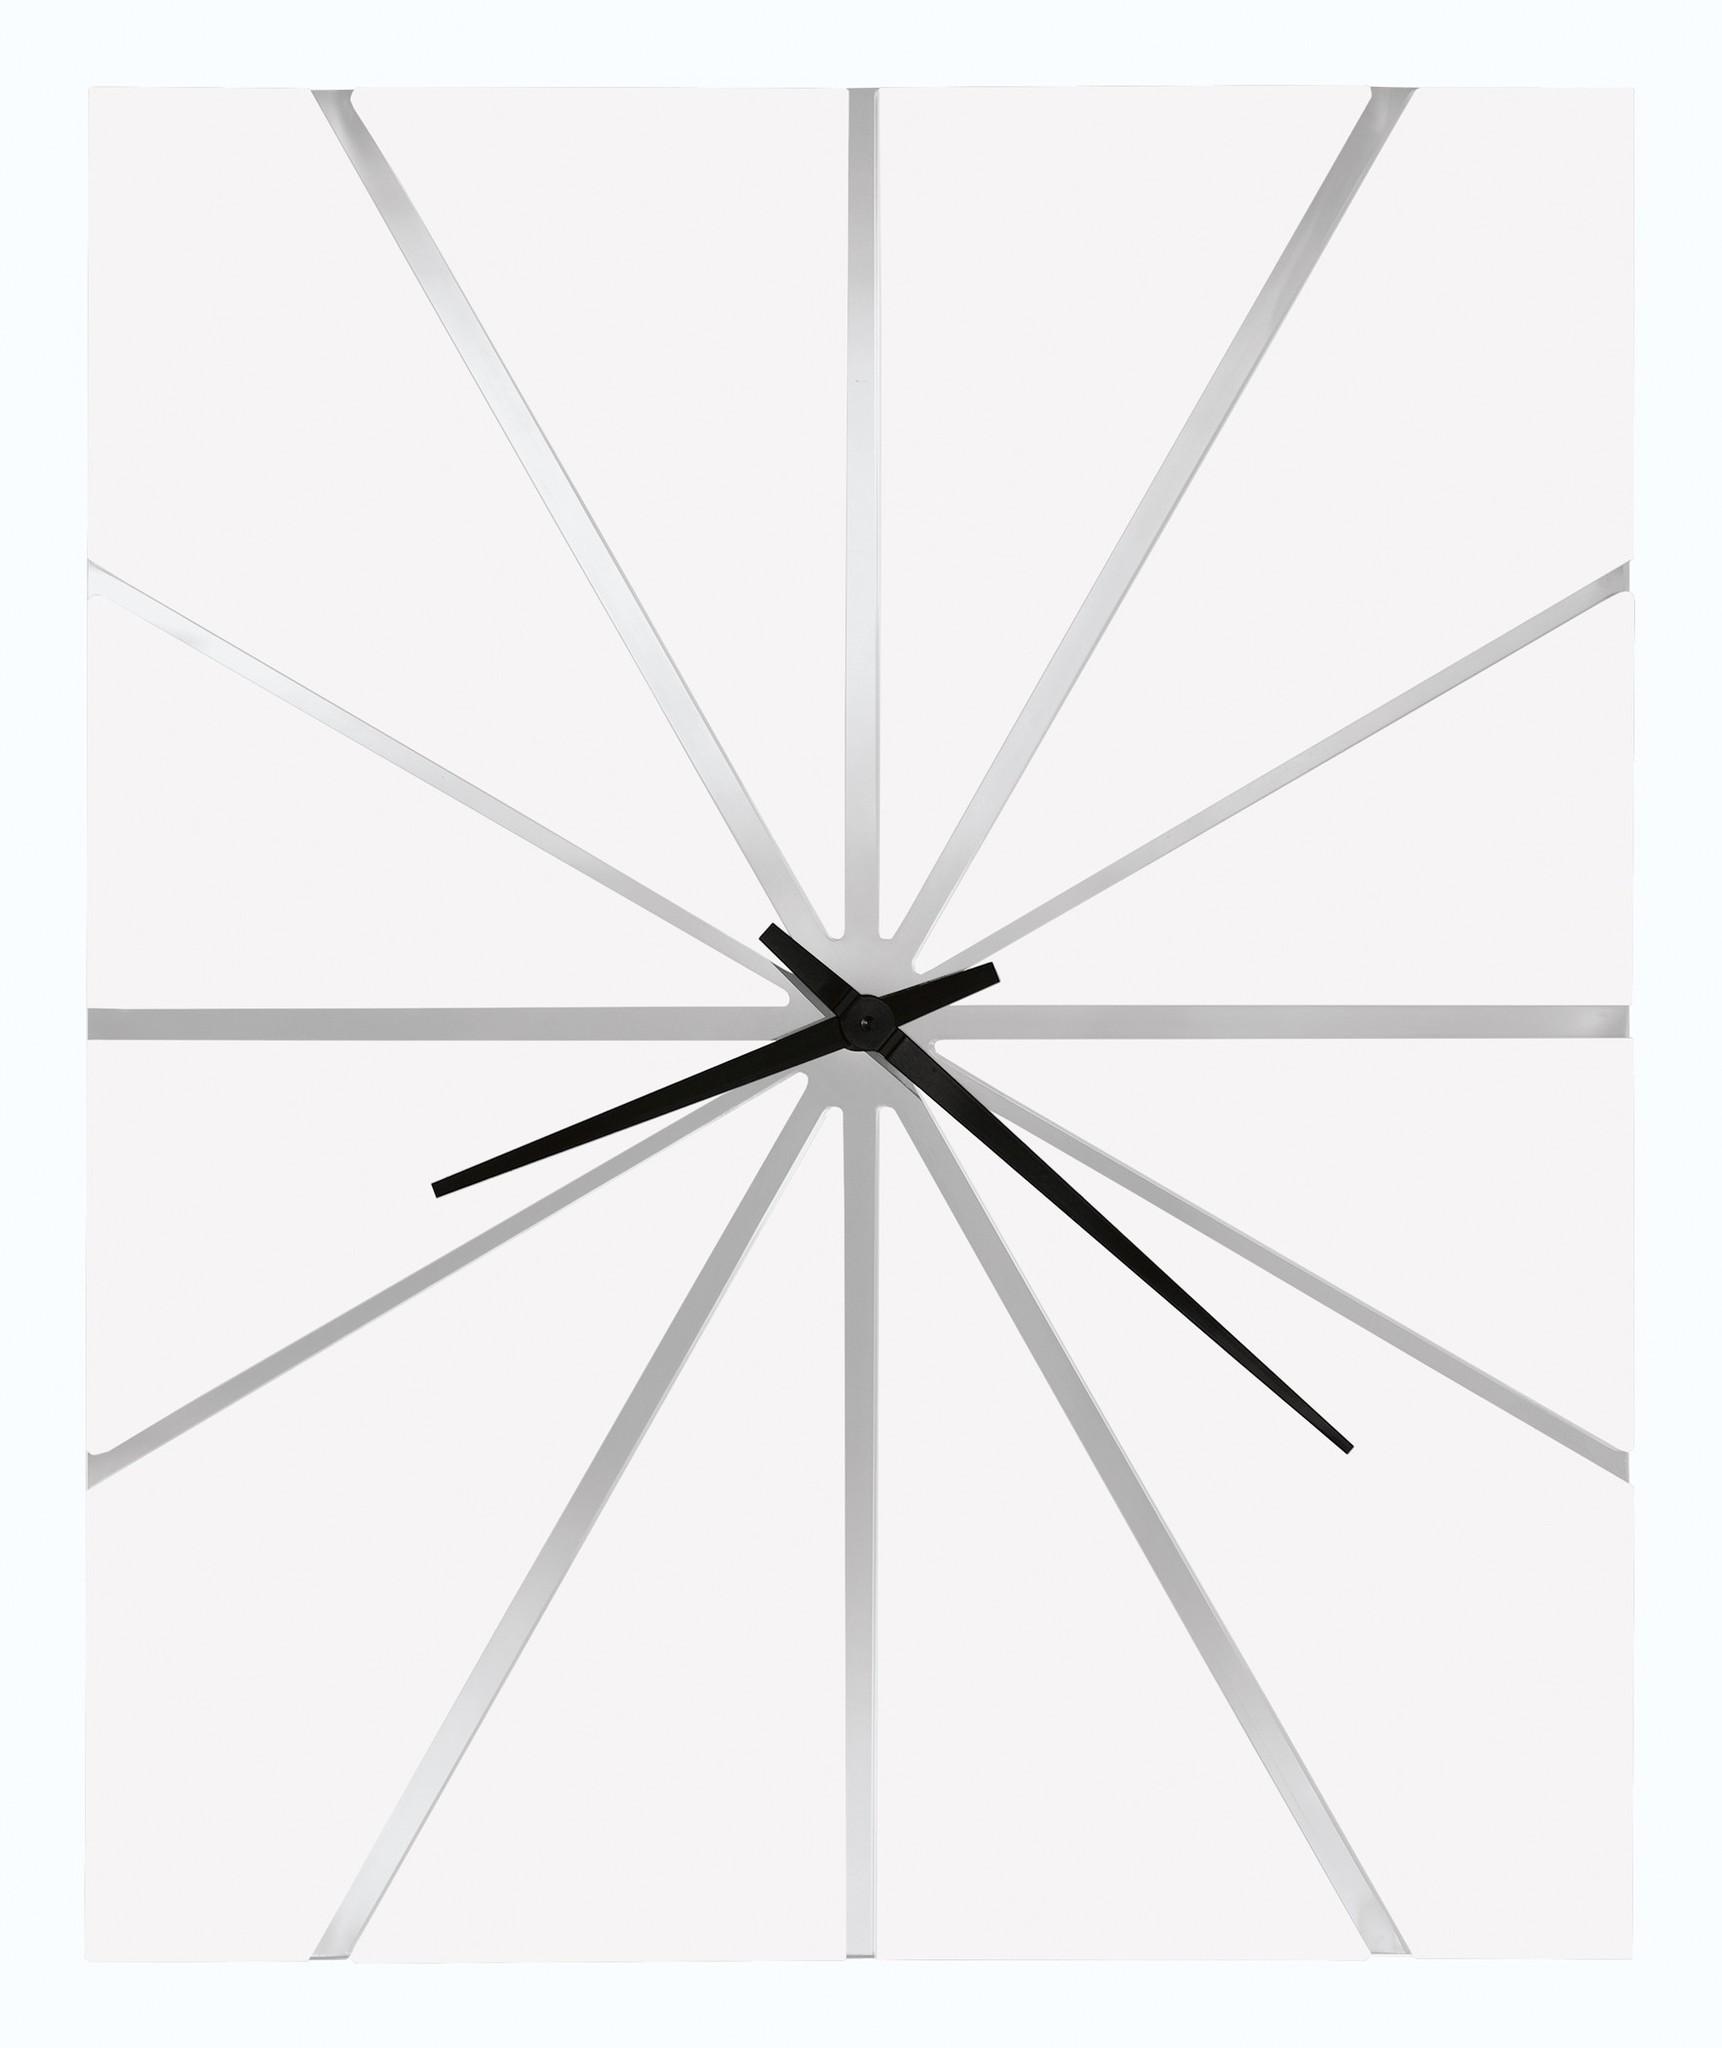 Часы настенные Часы настенные Howard Miller 625-616 Zander chasy-nastennye-howard-miller-625-616-zander-ssha.jpg